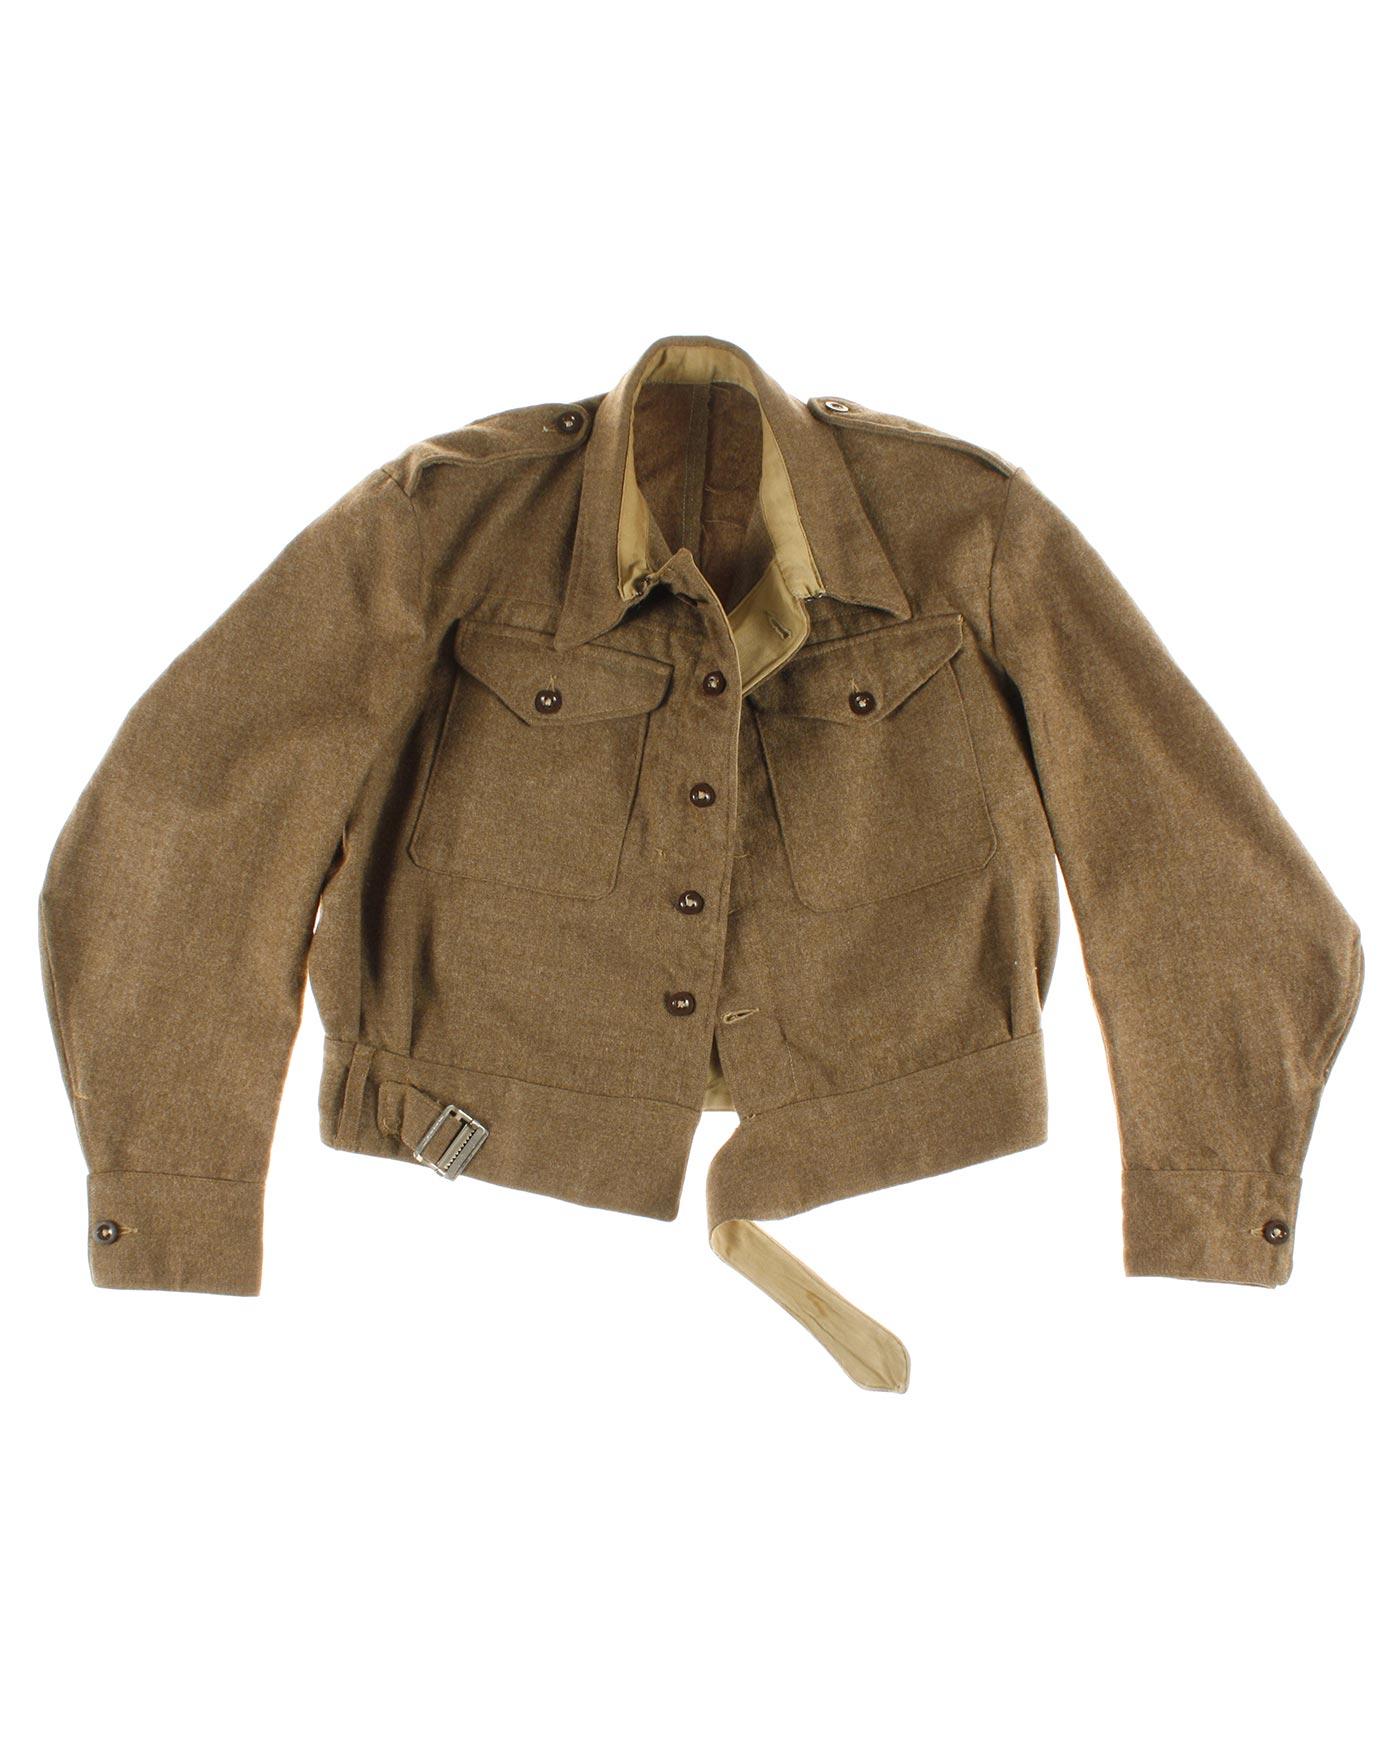 British battledress blouser '40s